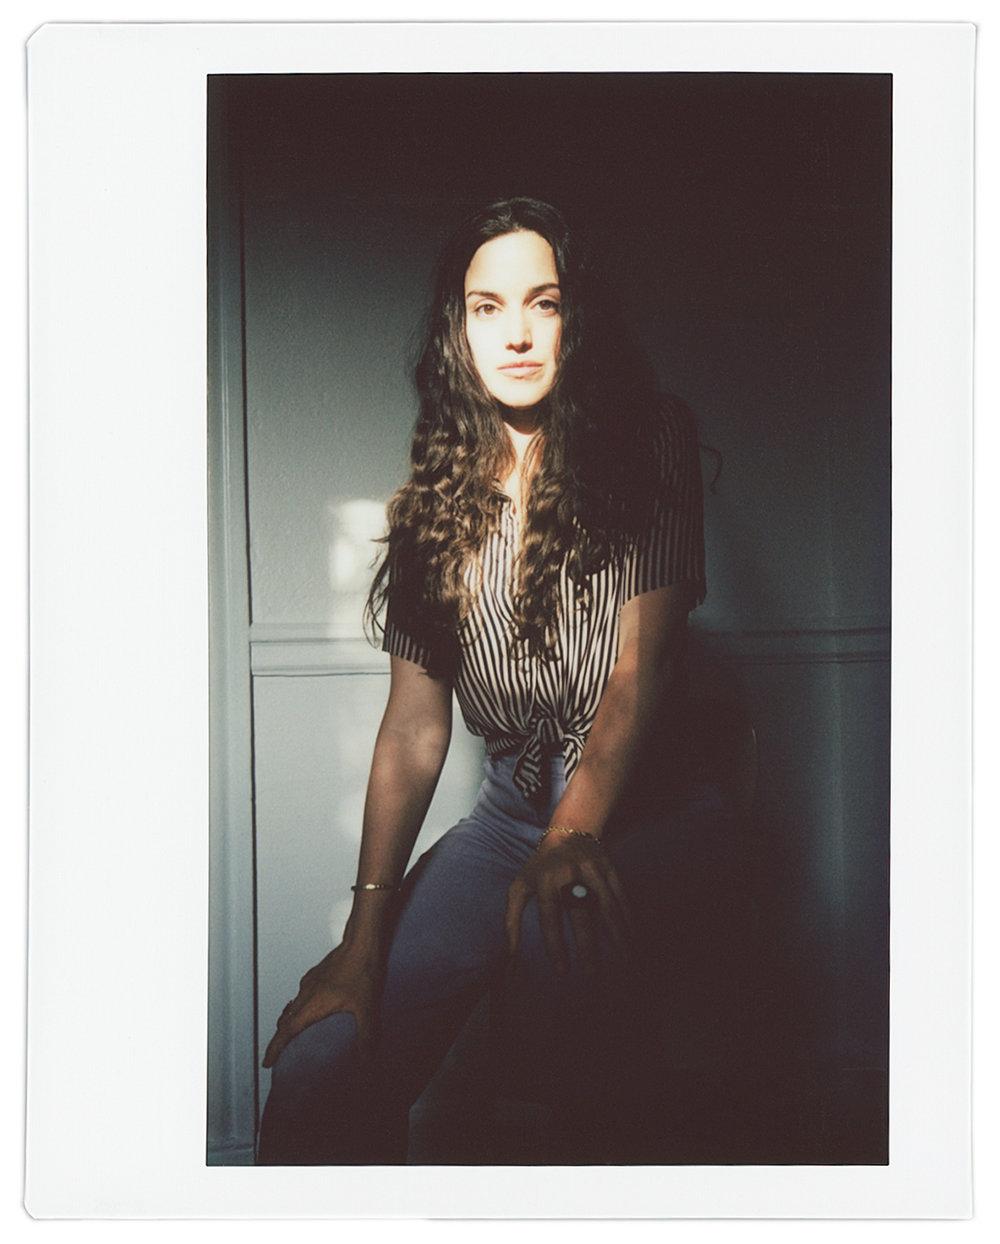 Arlene Deradoorian, Singer & Percussionist (USA)